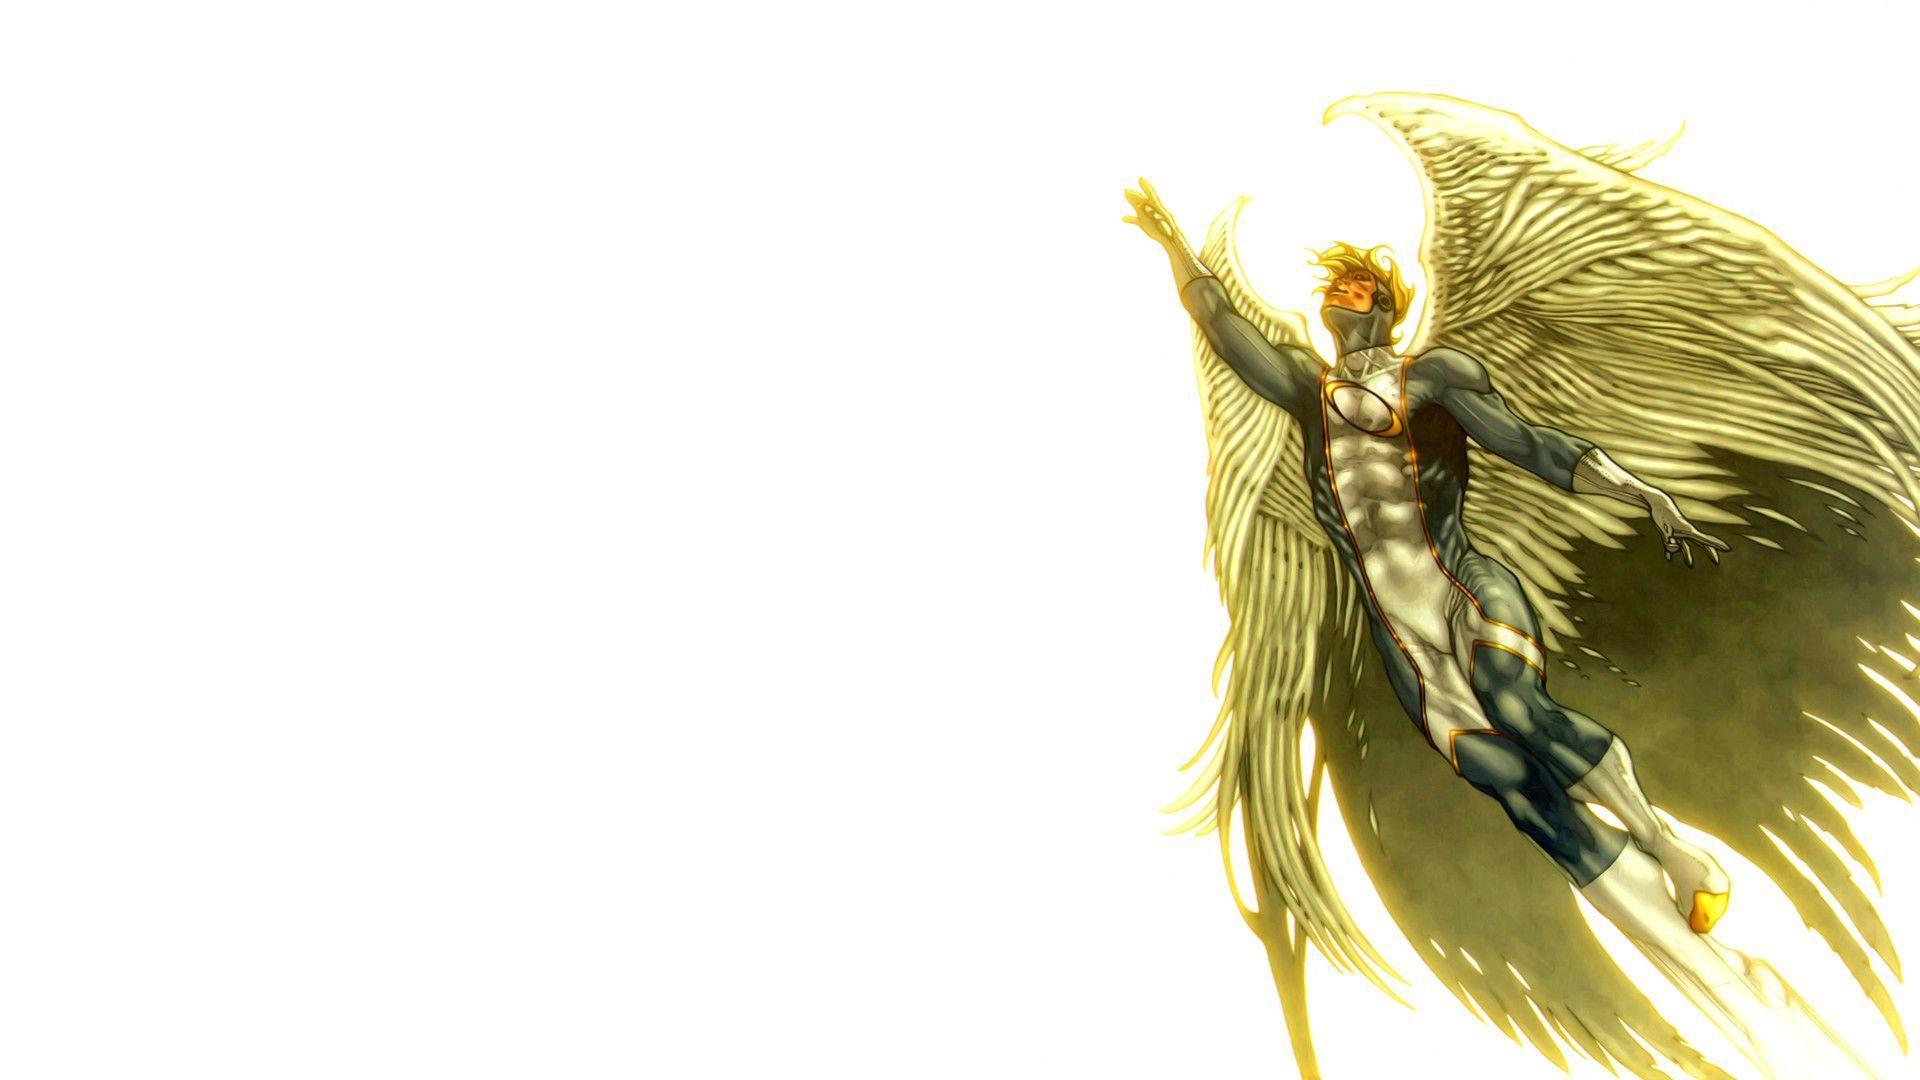 archangel michael wallpaper for computer - photo #22